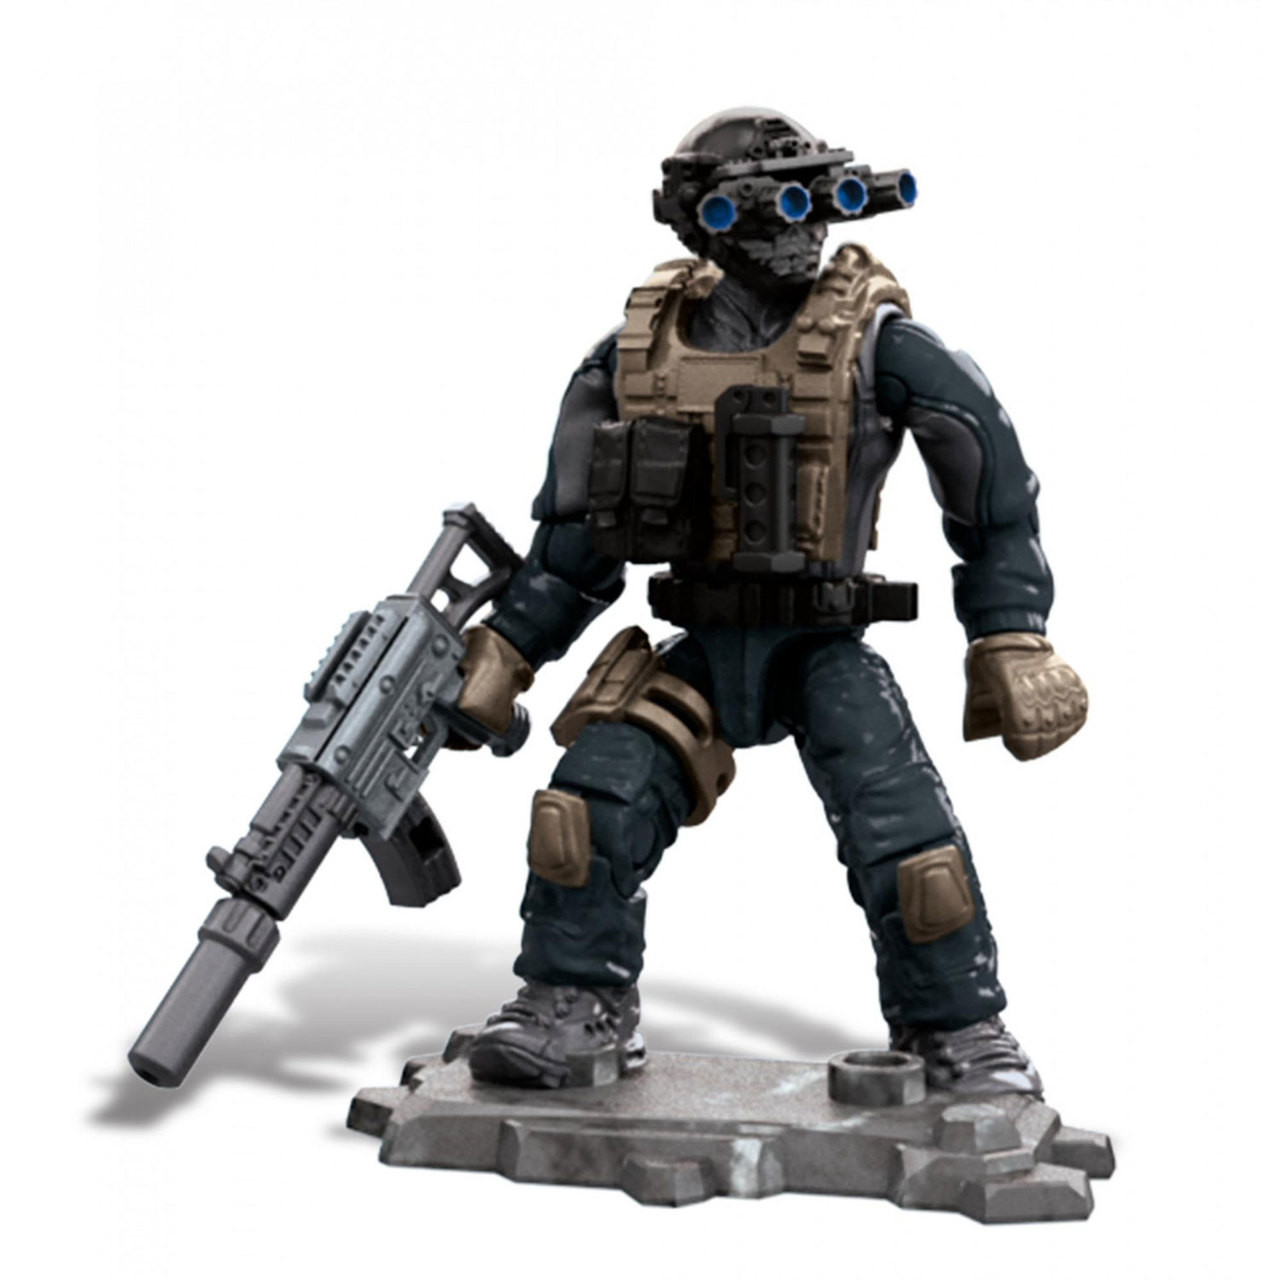 Mega Bloks Building Toys Toys Hobbies Mega Construx Call Of Duty Series 3 Specialist Keegan P Russ New